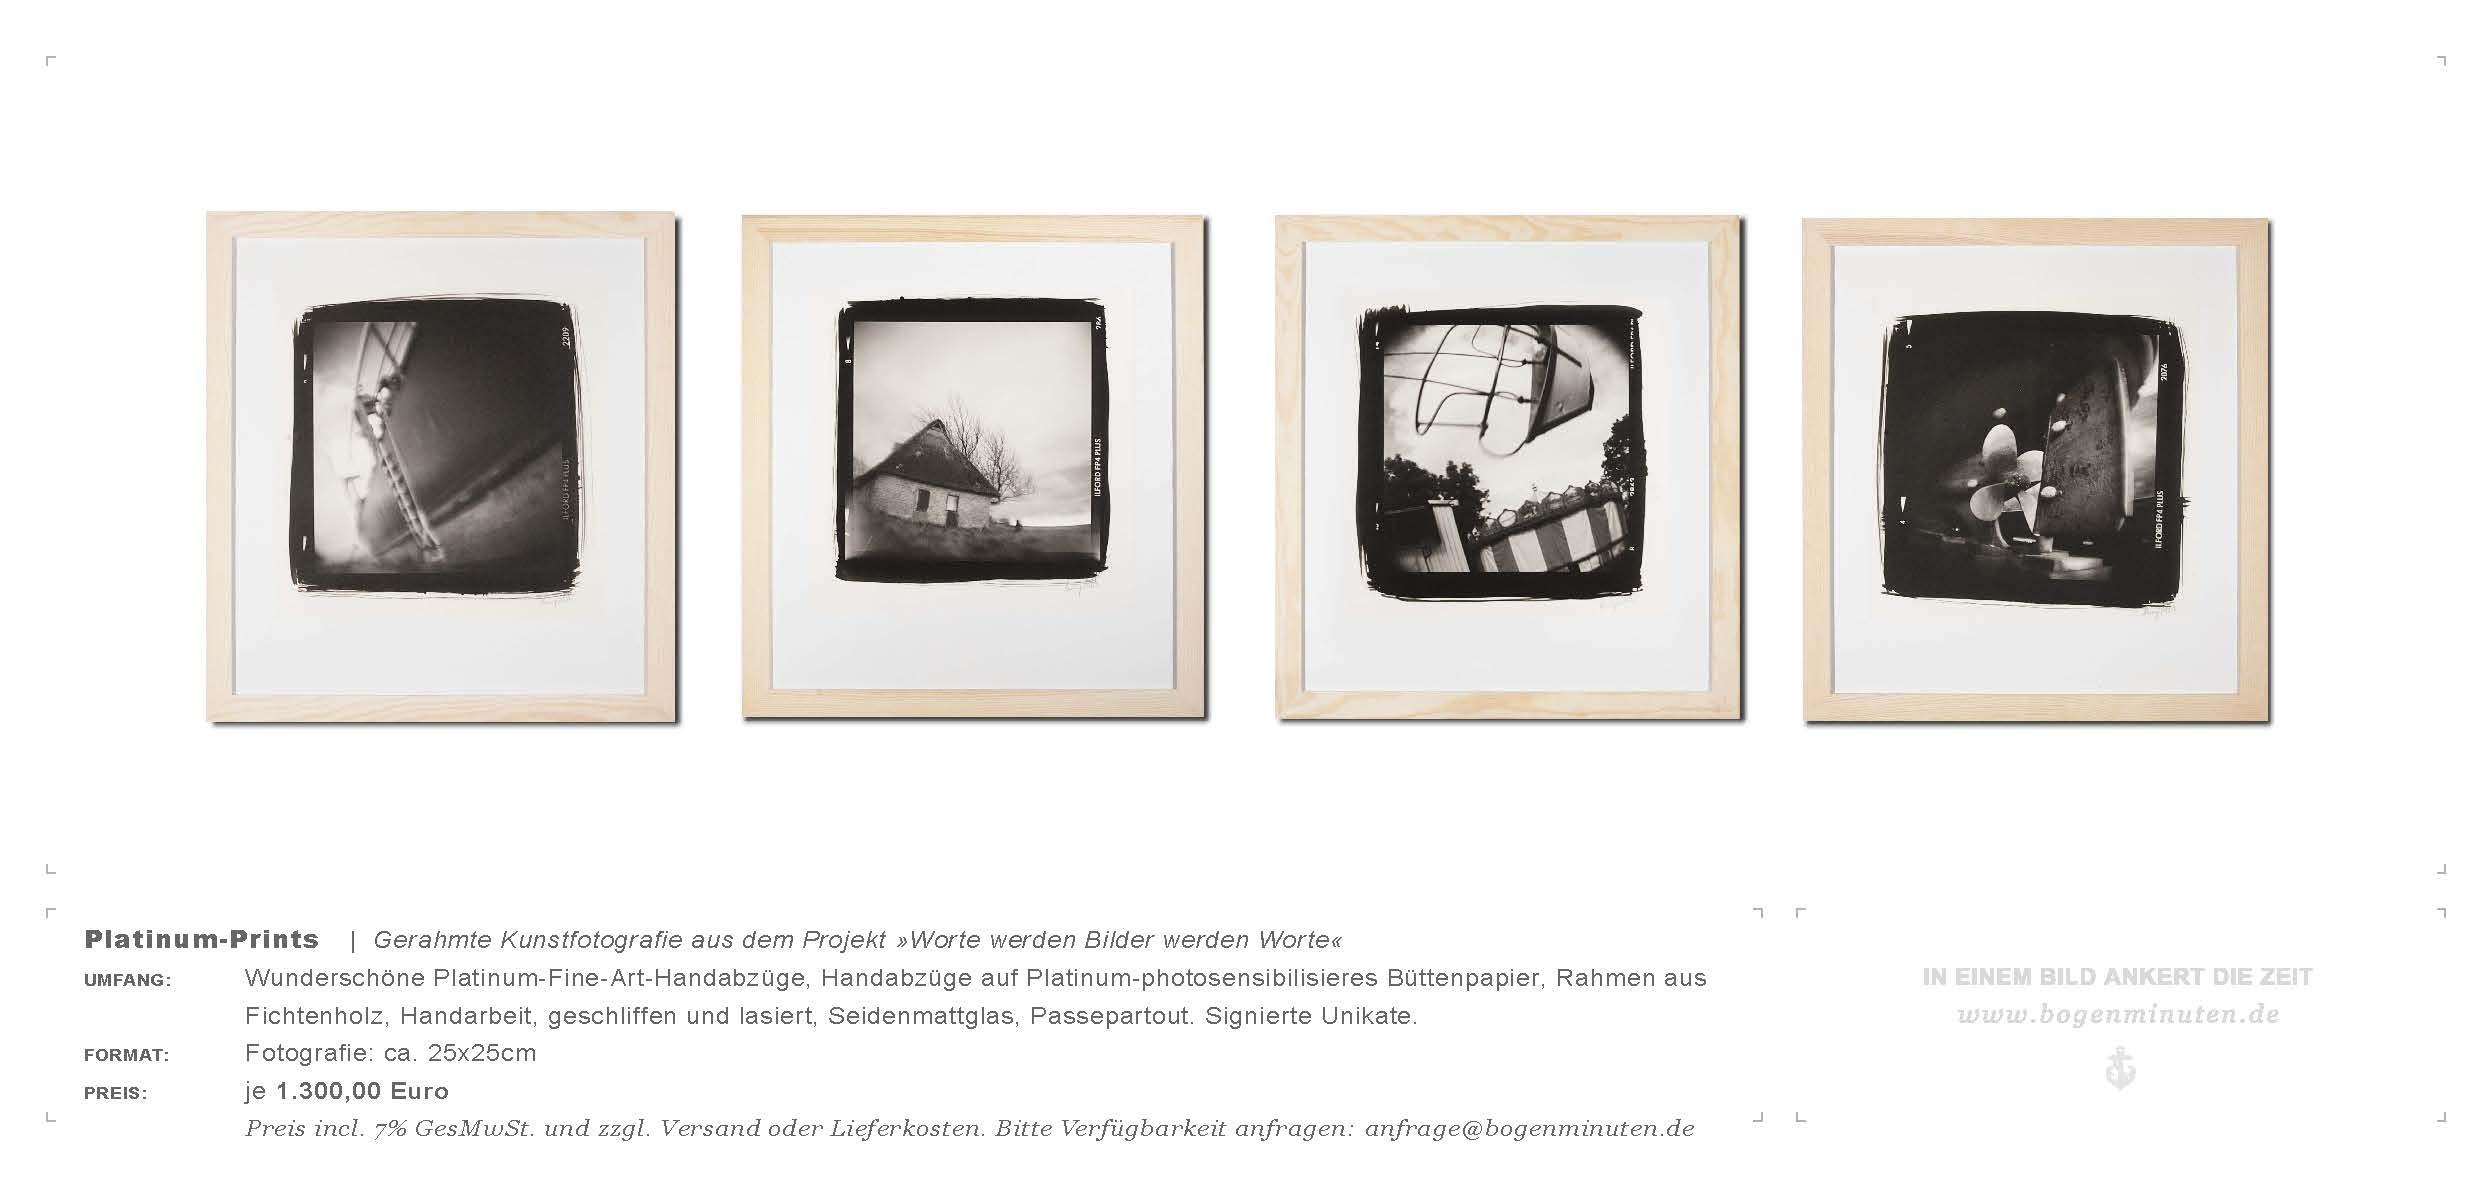 Erfreut Lds Gerahmte Kunst Galerie - Bilderrahmen Ideen - szurop.info